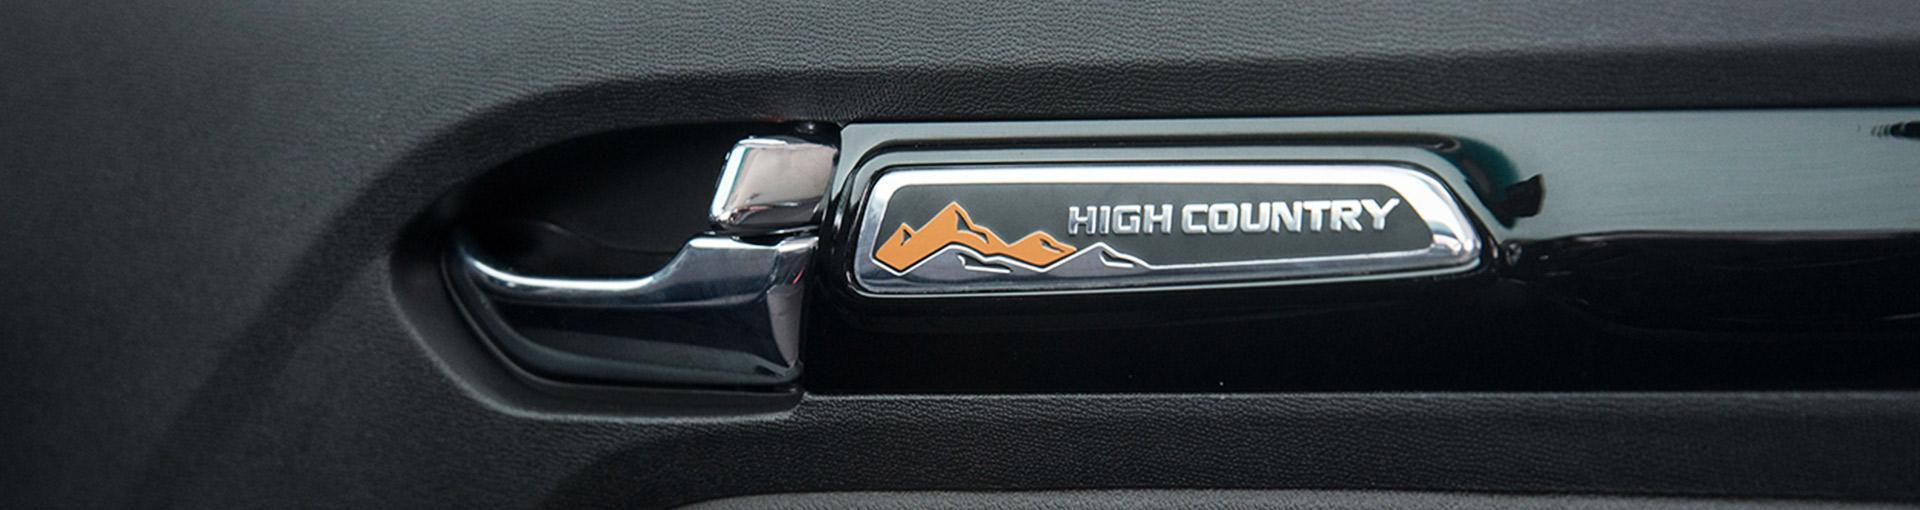 Chevrolet S10 High Country detalhes